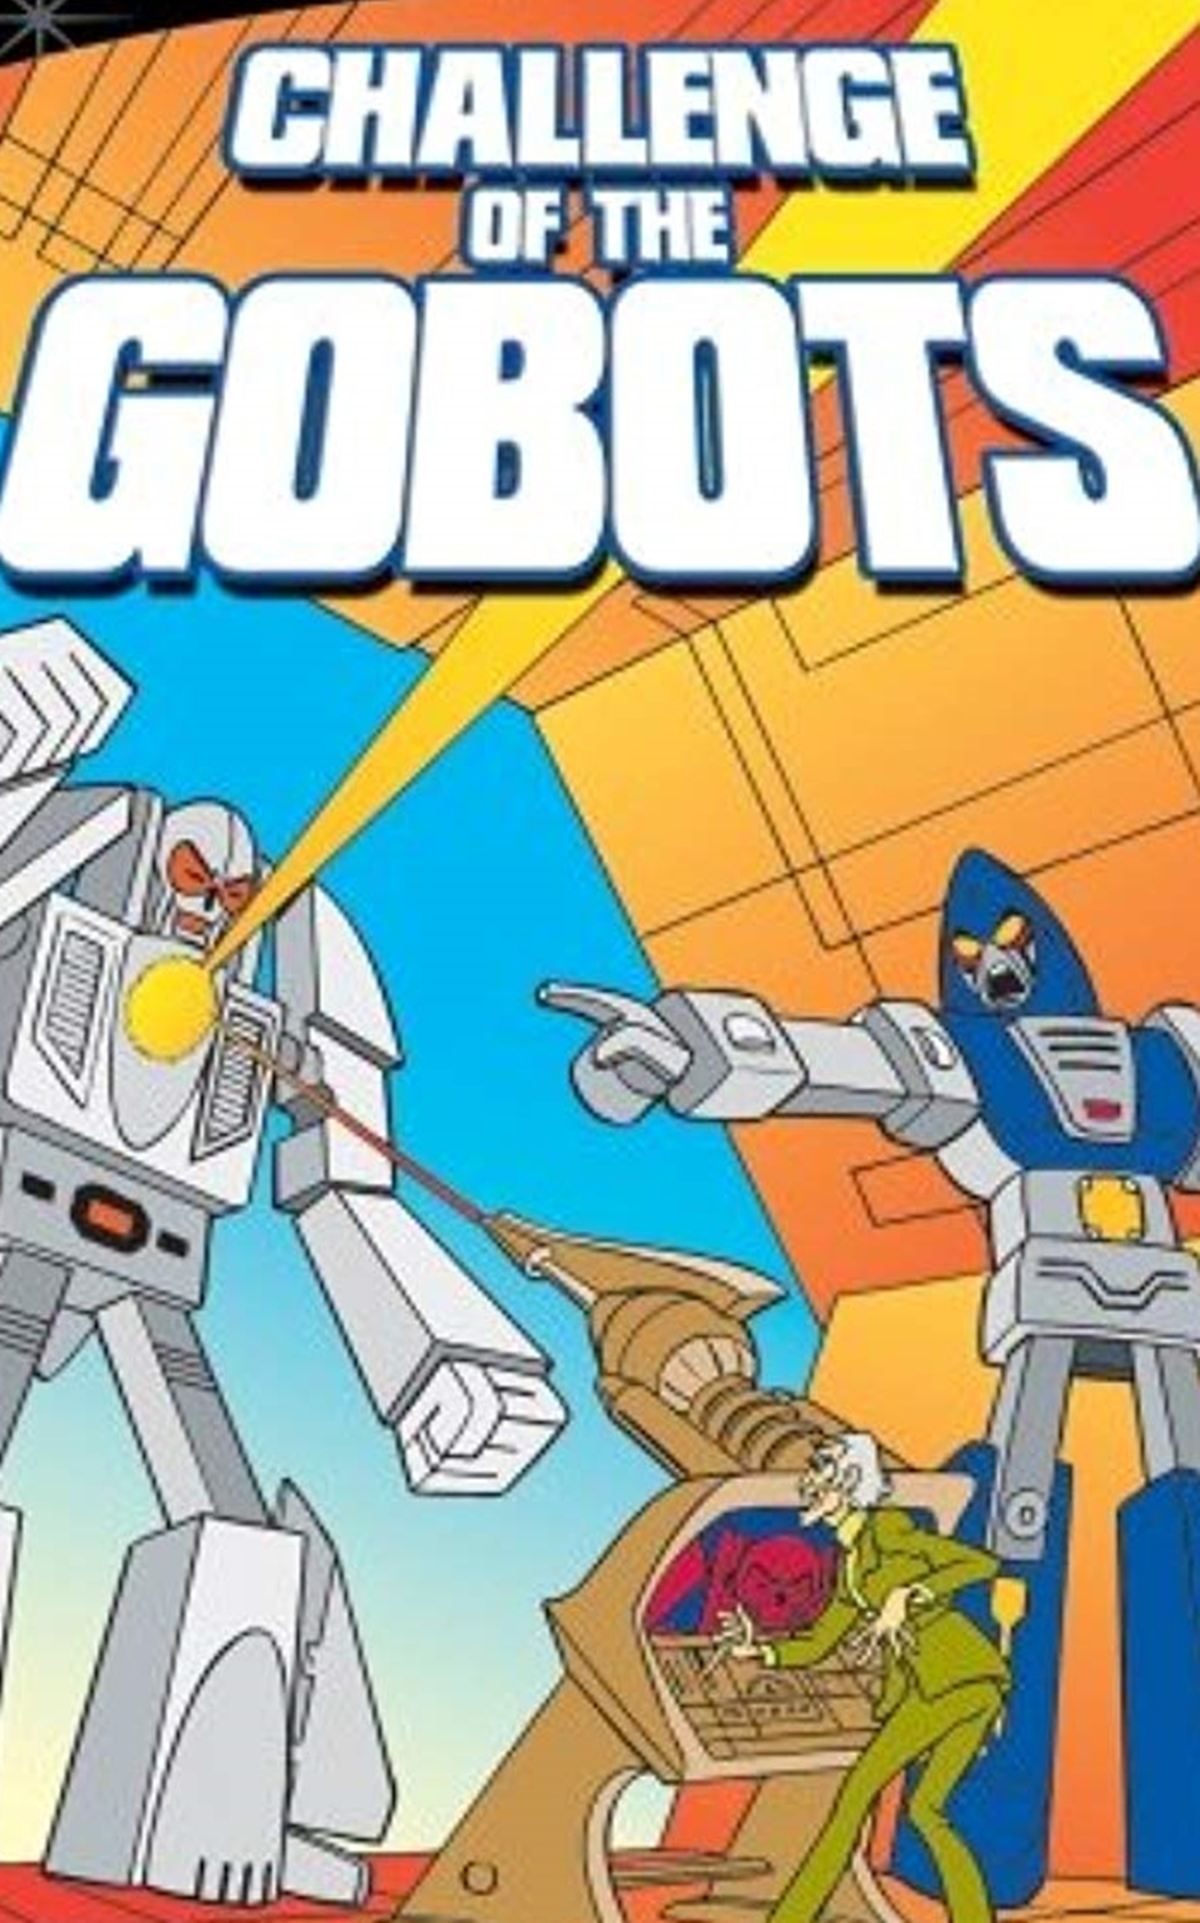 3 24 15 Cartoons All 80s Boys Should Remember